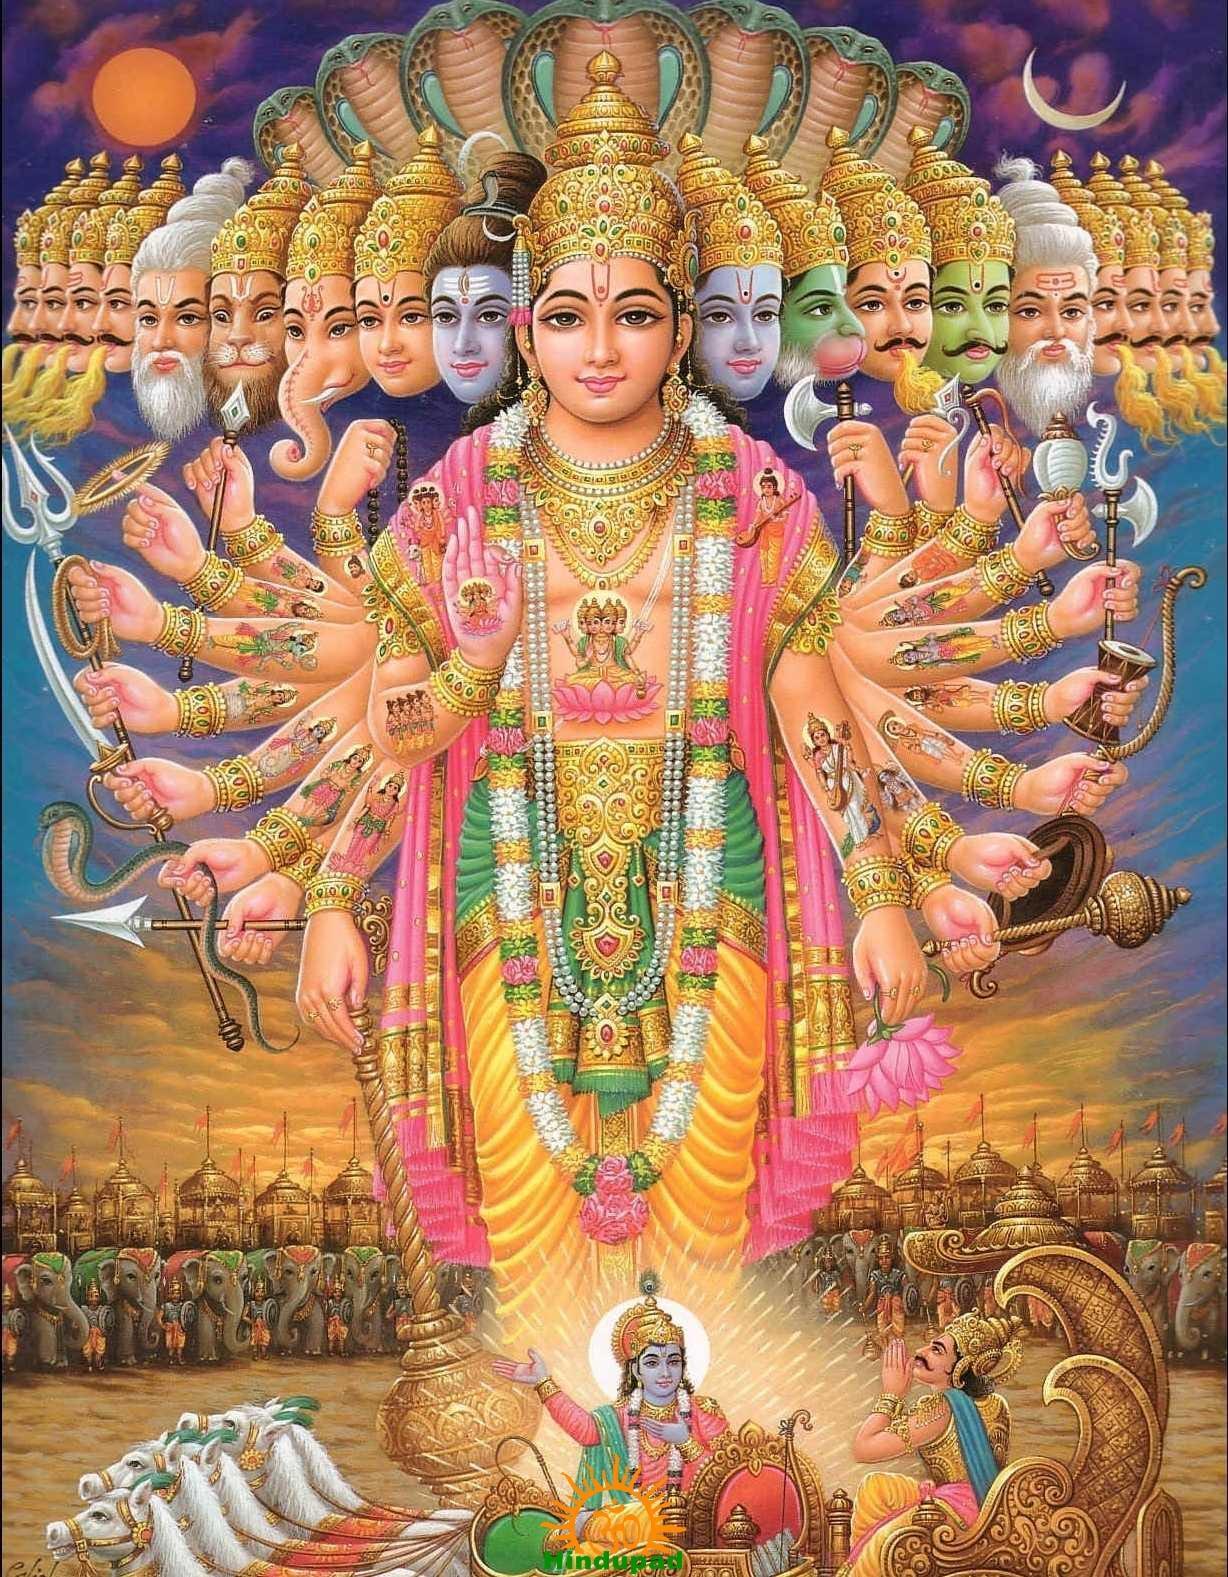 https://hindupad.com/wp-content/uploads/2011/10/lord-vishnus-24-avataras.jpg